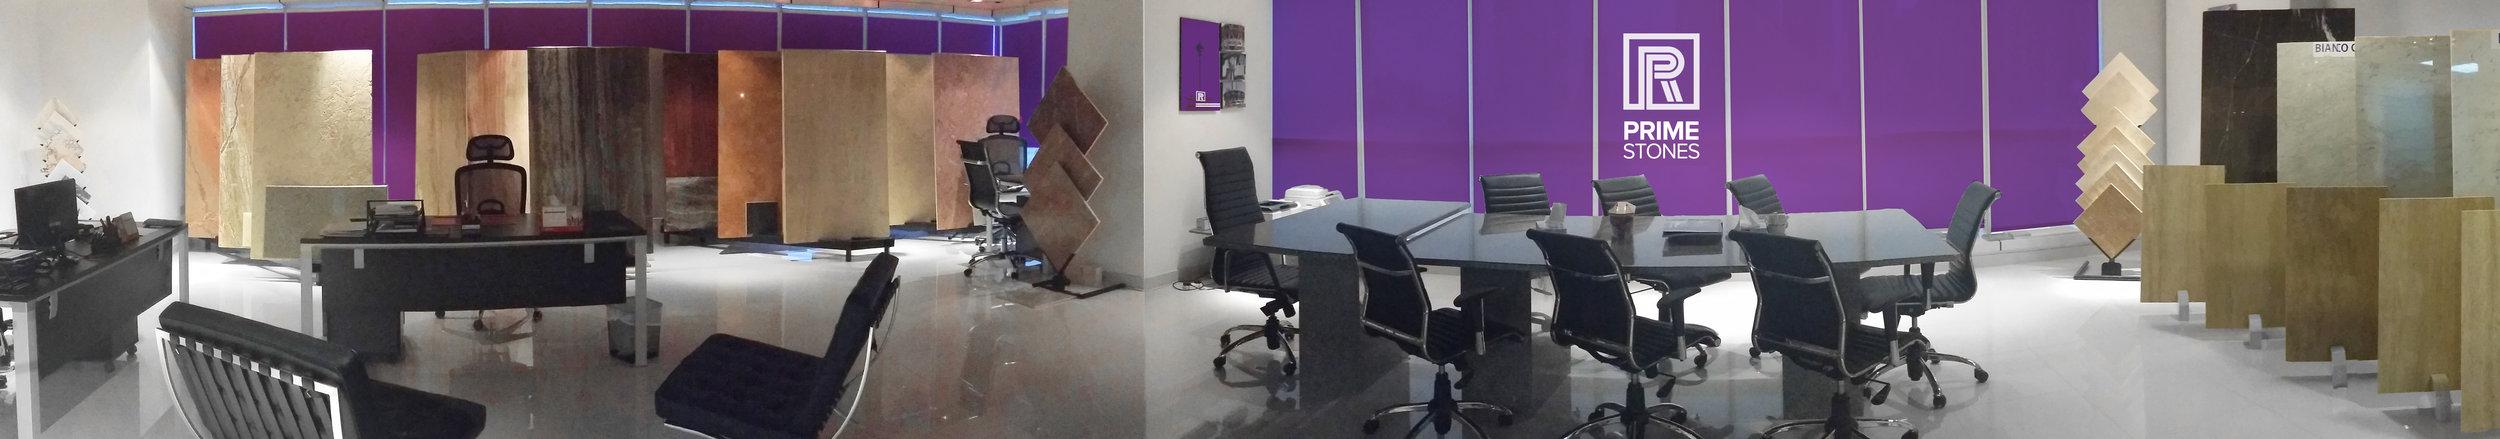 Toronto Brand strategy Design Consultancy studio – Prime Stones rebranding – Environmental Design, Office Interior